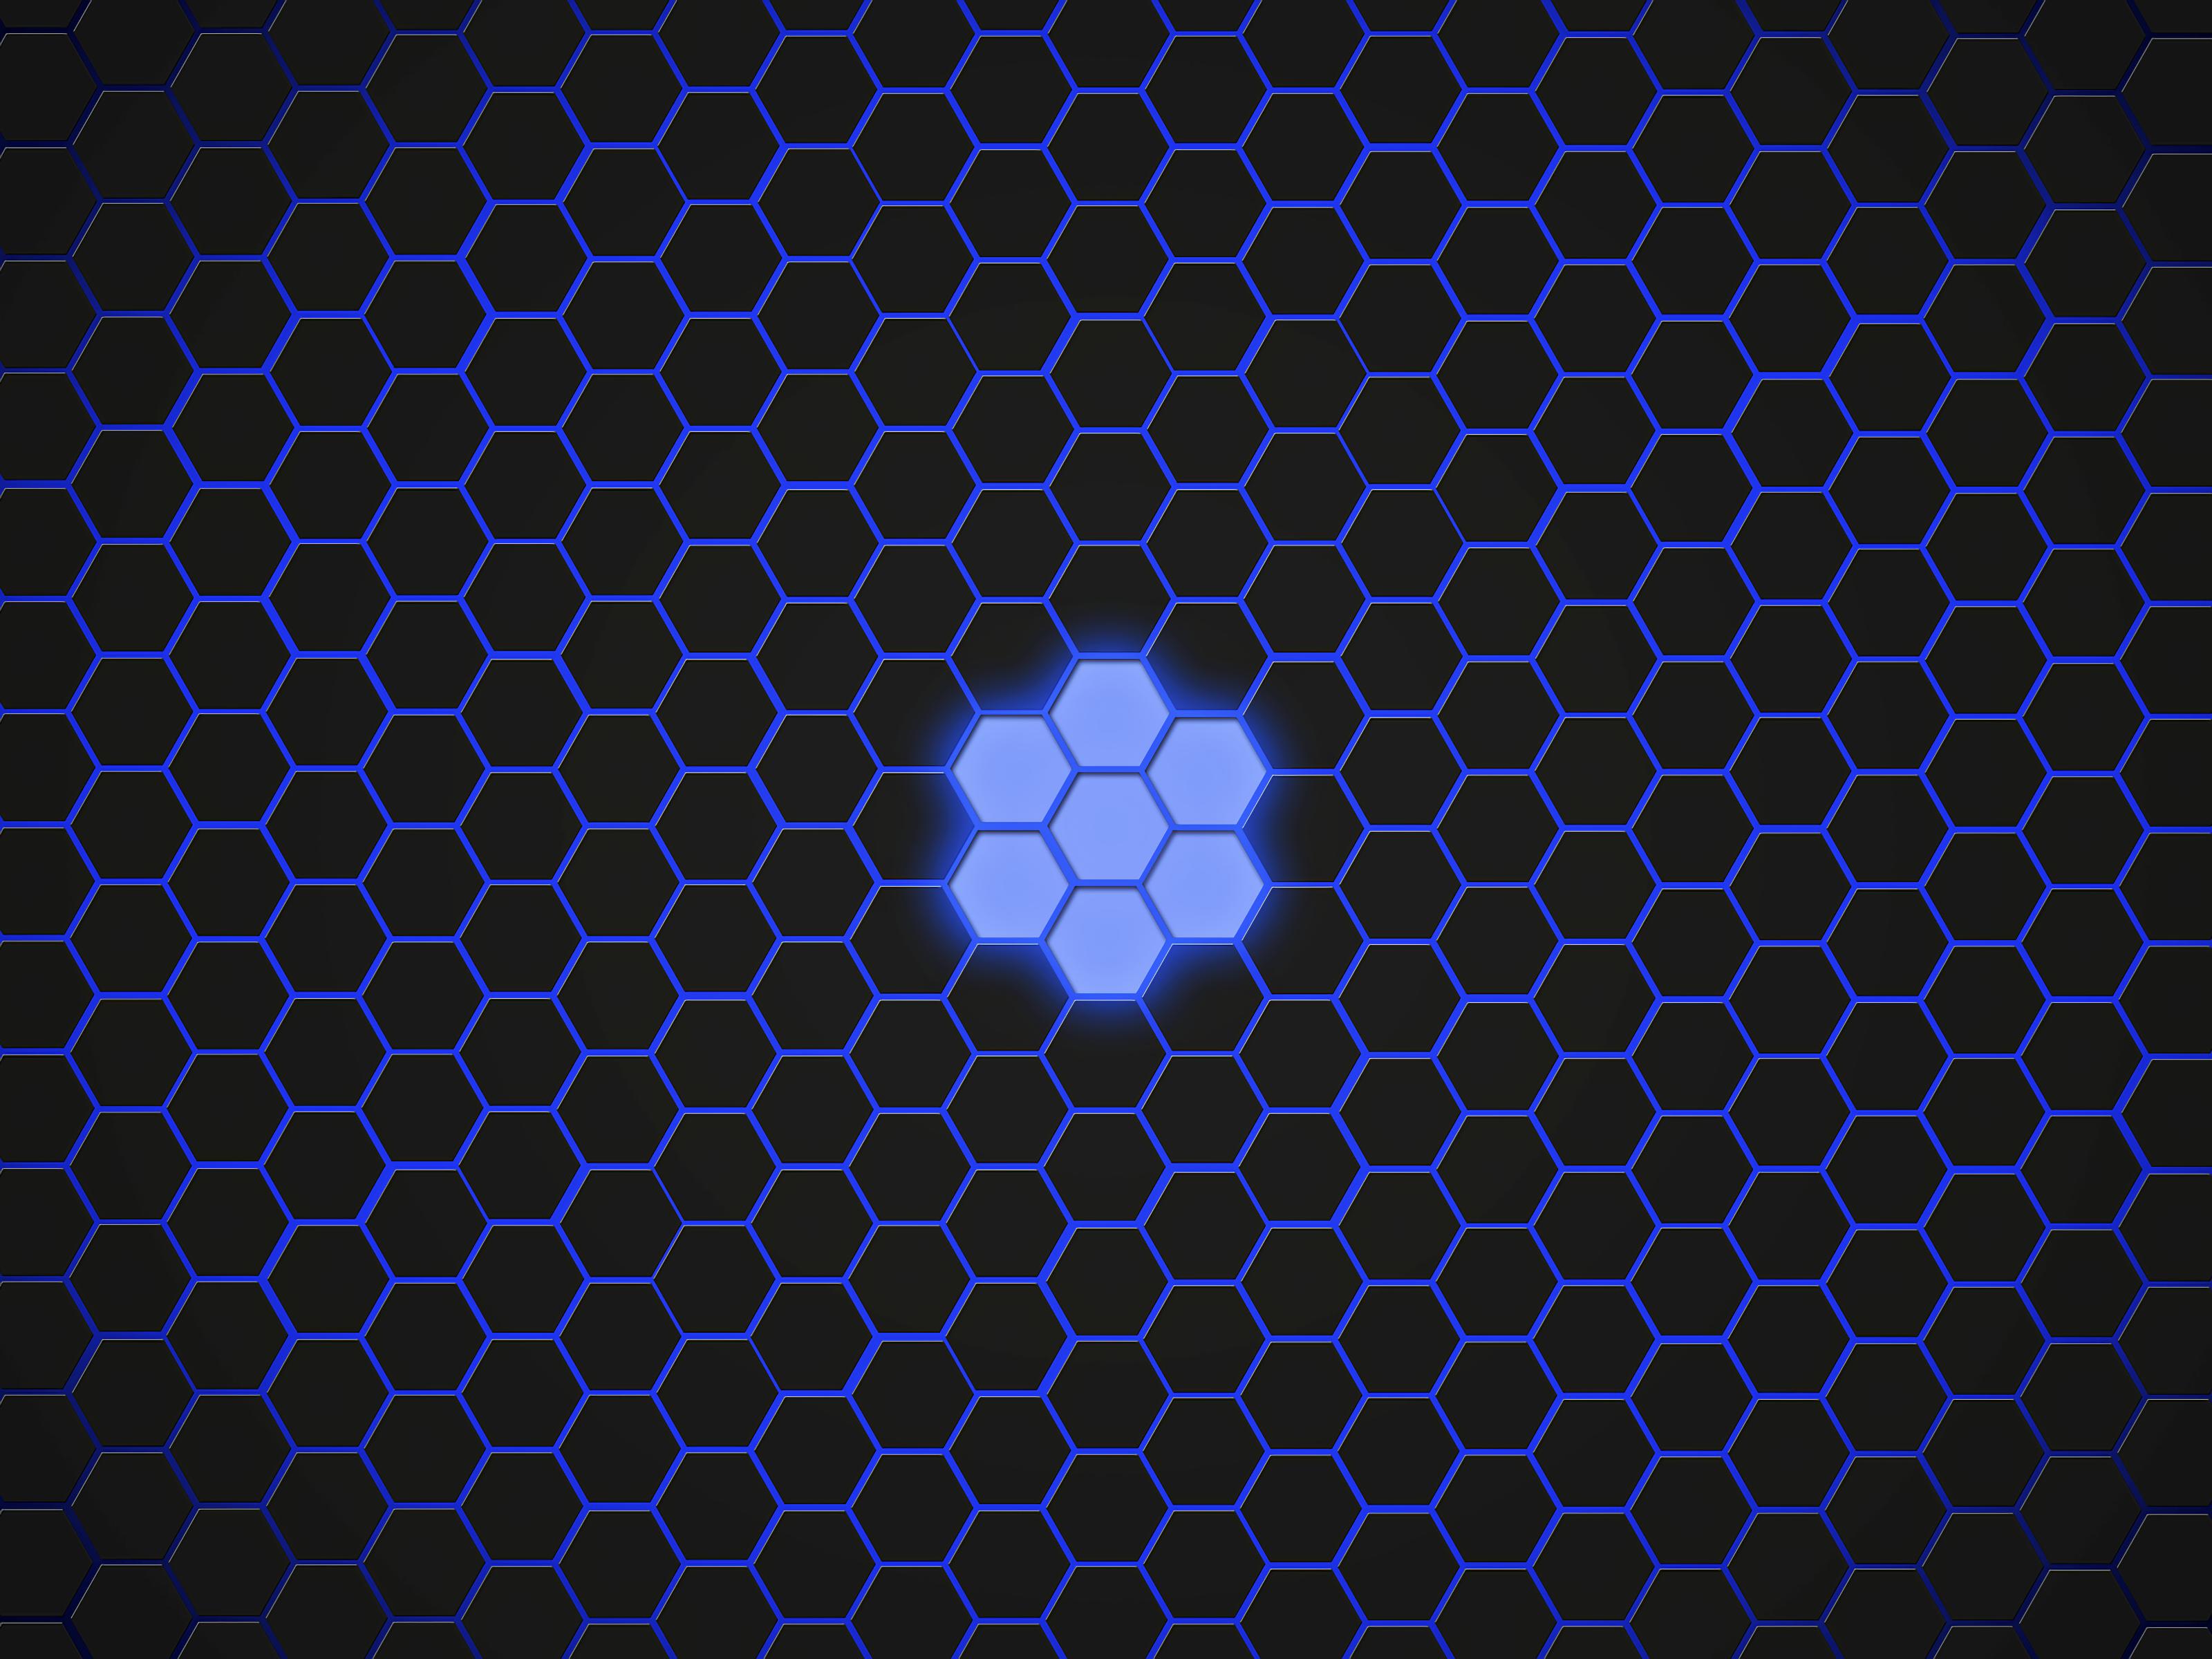 Artistic Blue Digital Art Hexagon Pattern 3200x2400